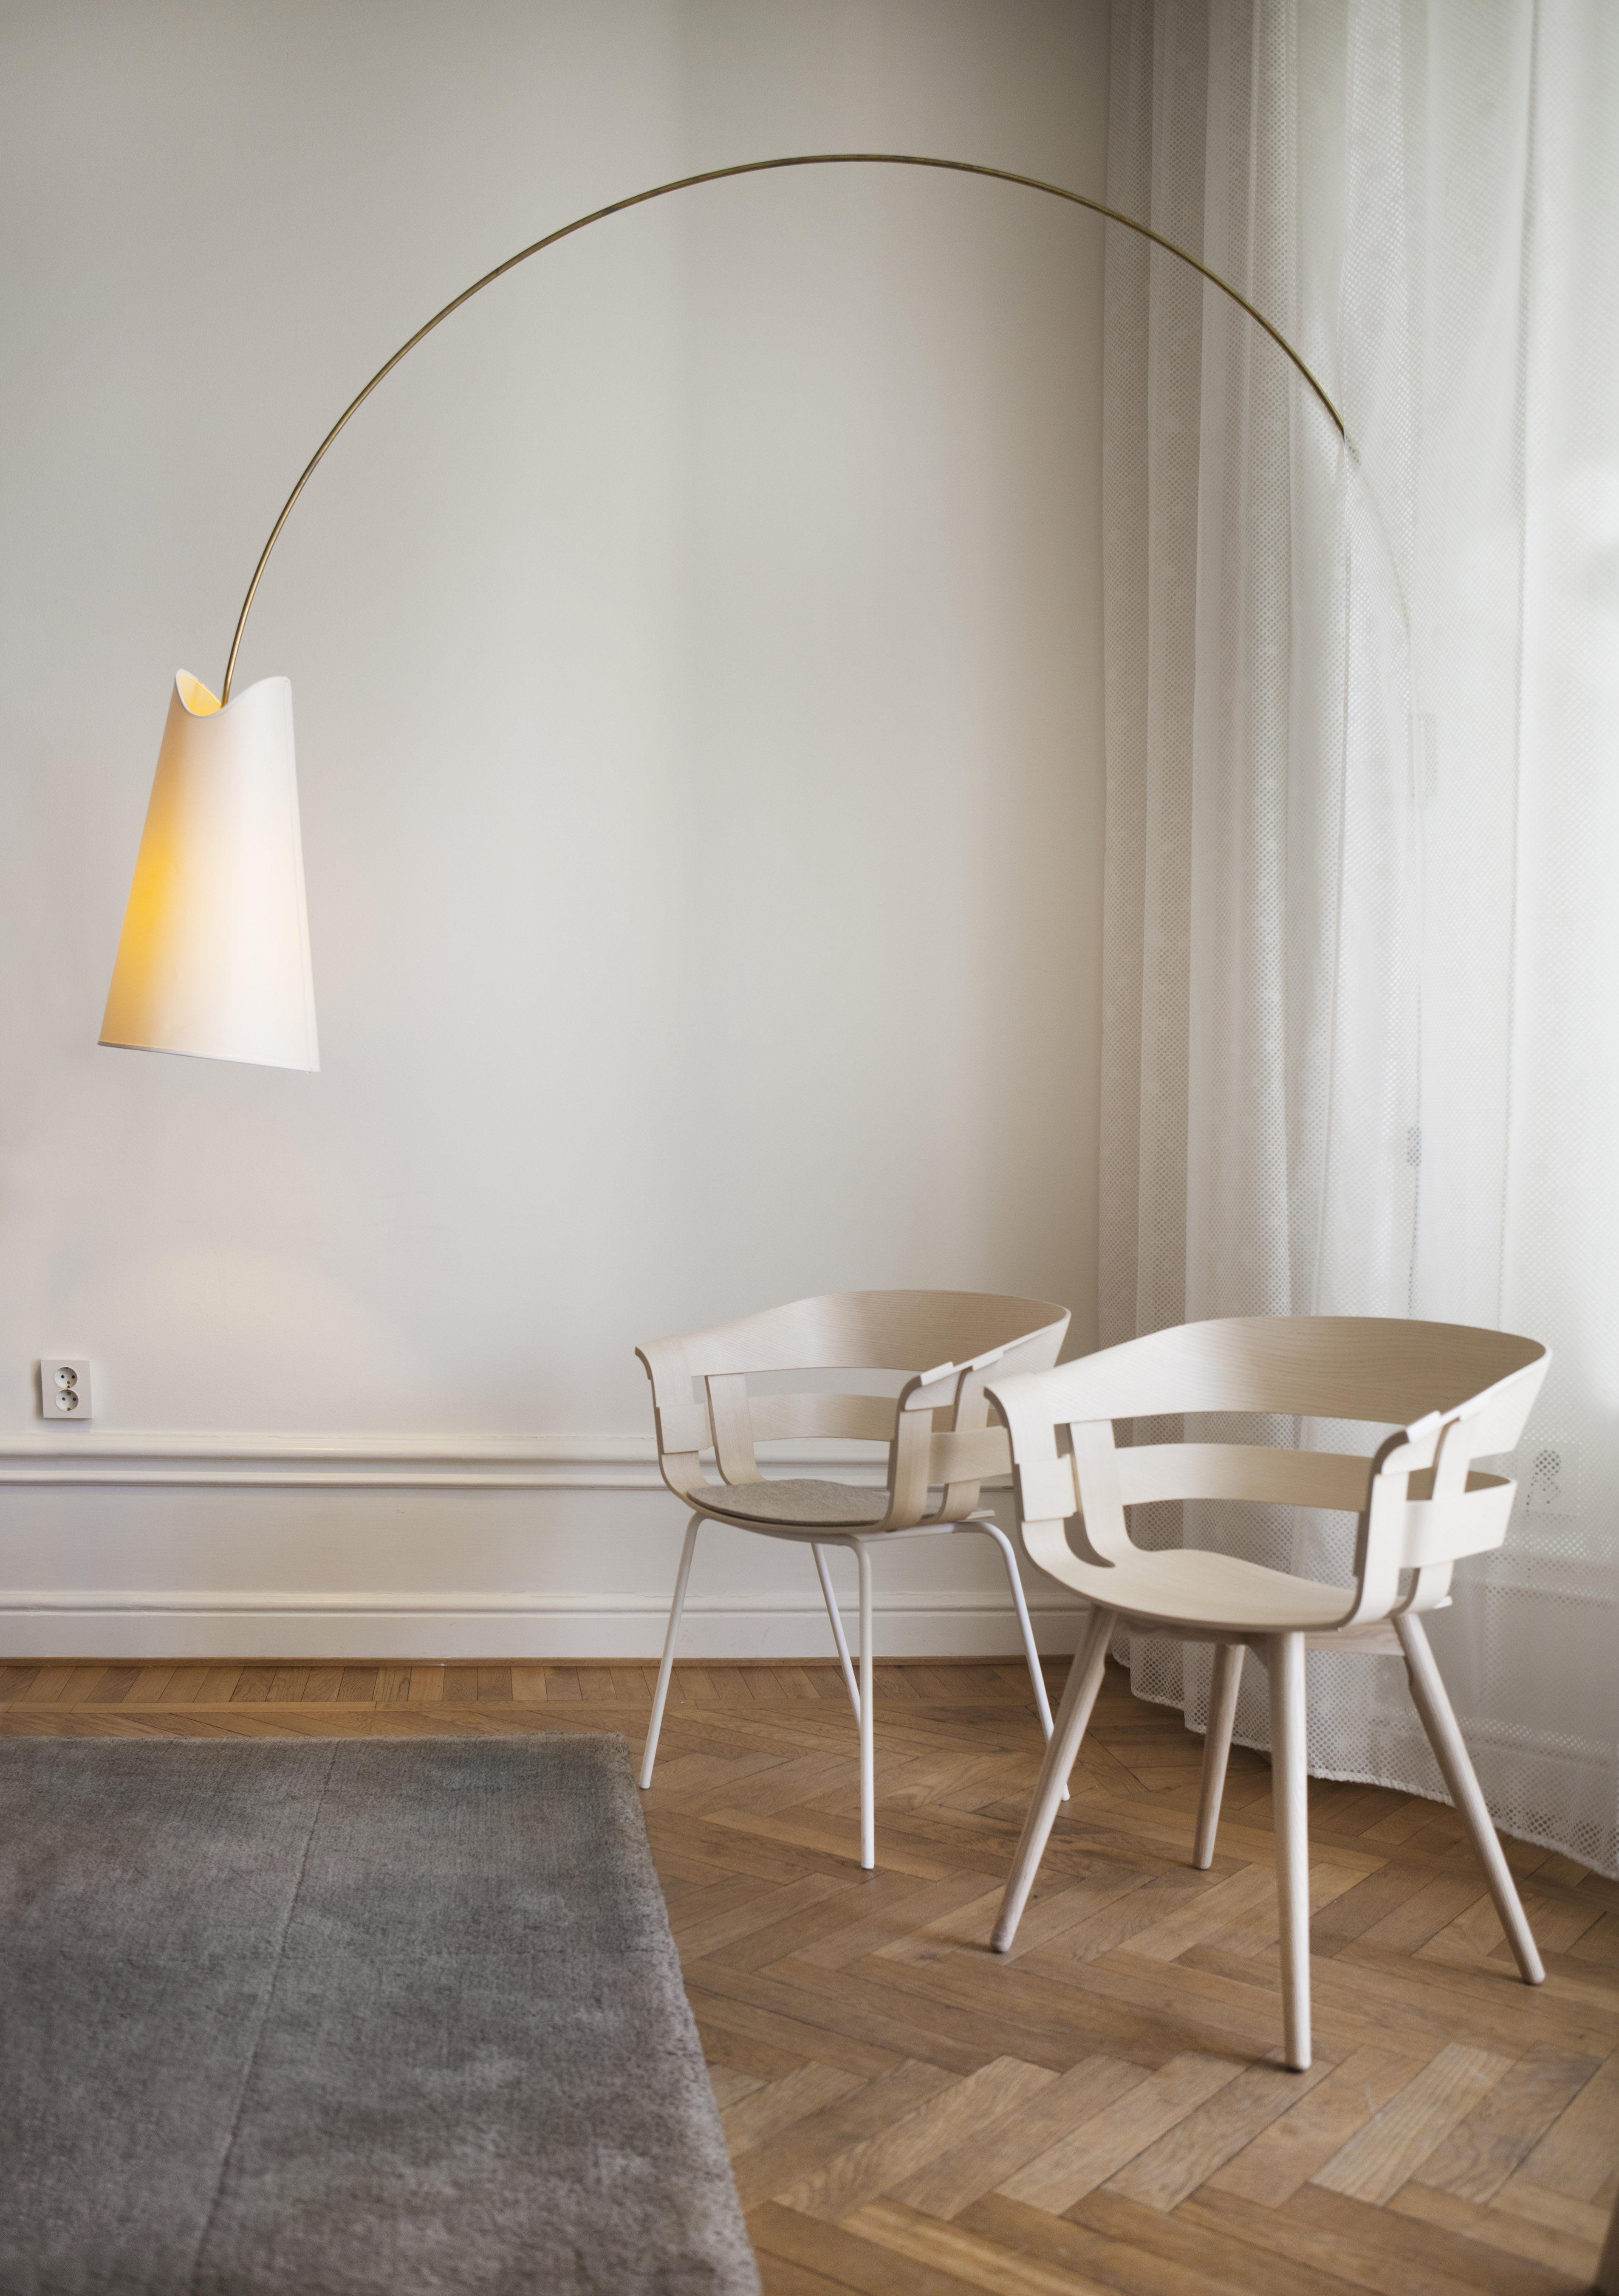 F r armlehnstuhl wick filz design house stockholm for Design armlehnstuhl